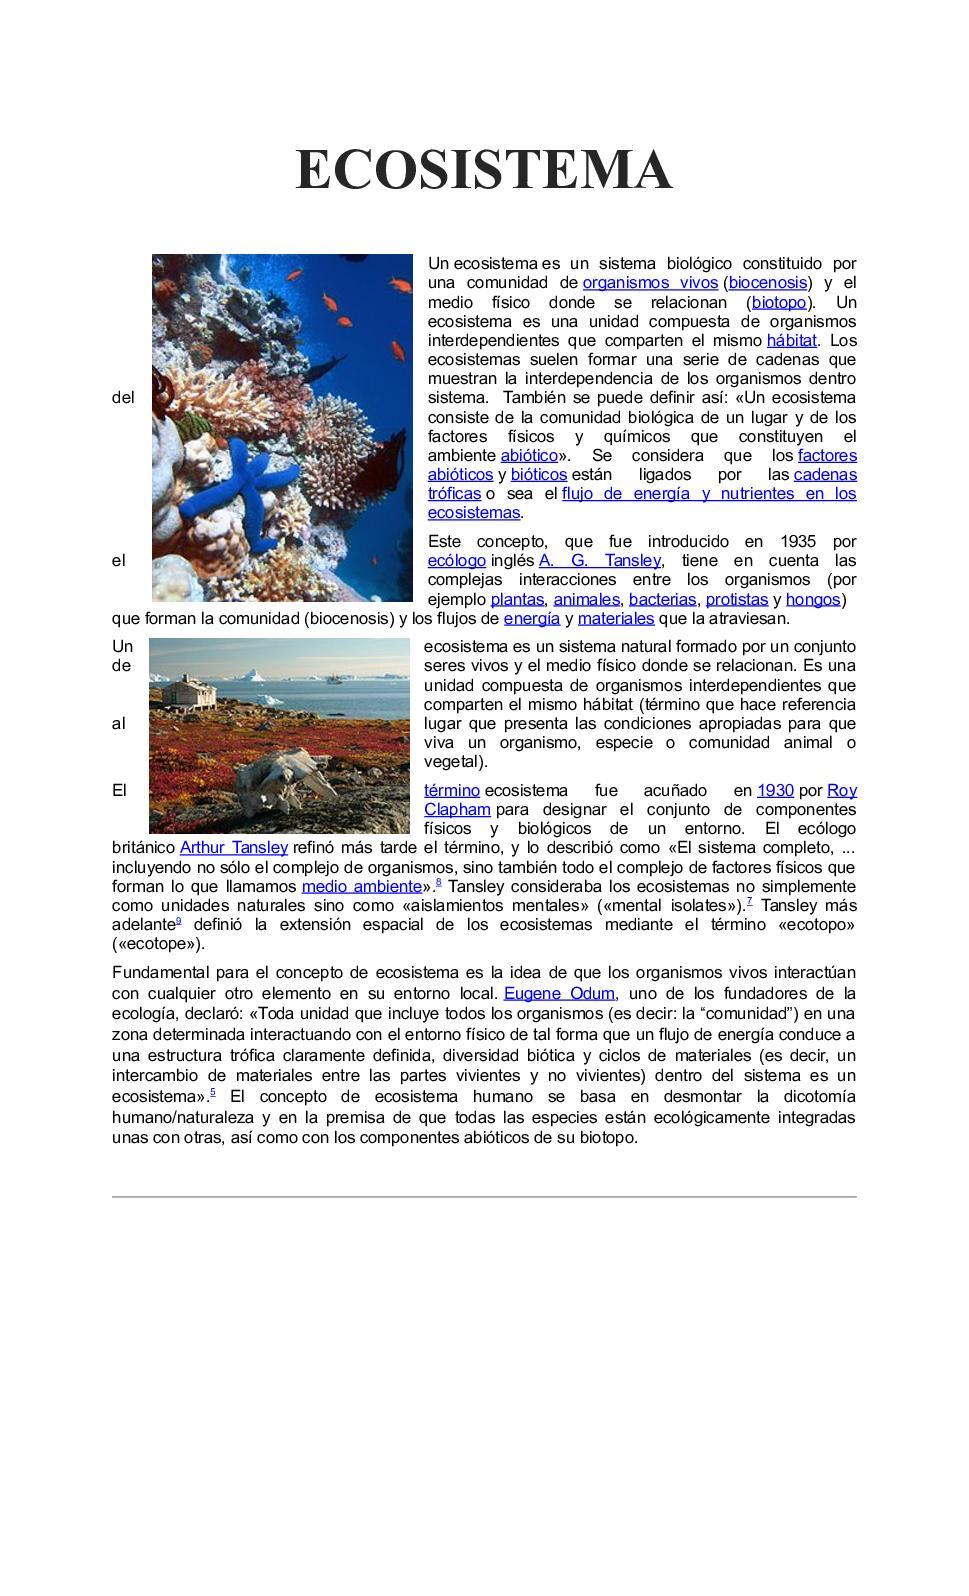 mutualismo comensalismo parasitismo en la tundra